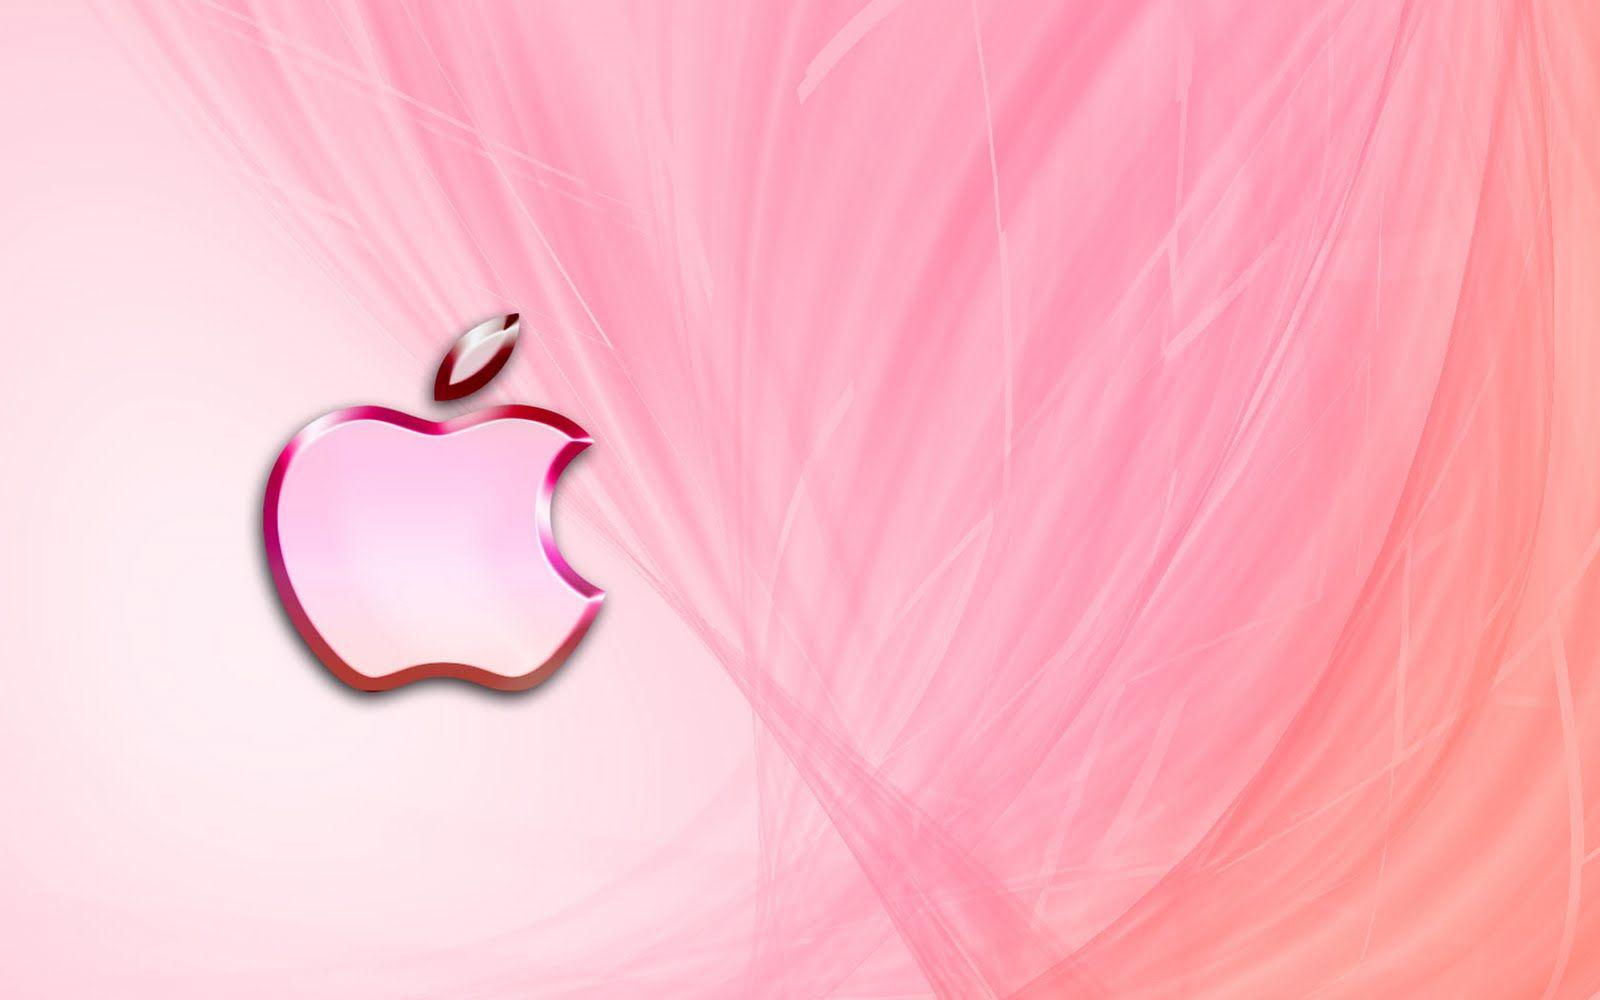 My Apple Fondos De Pantalla Femeninos Fondos De Pantalla Digitales Rosas Fondo De Pantalla